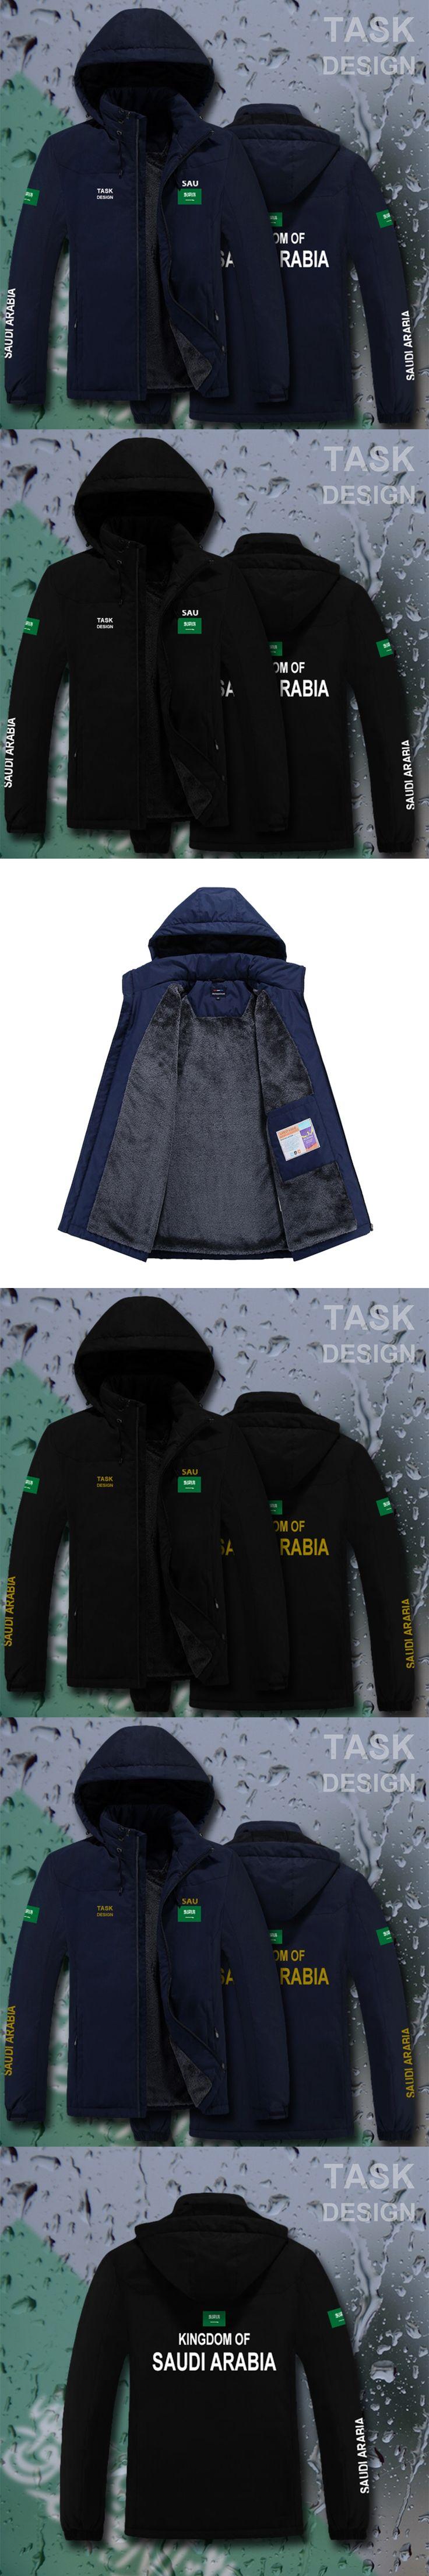 Saudi Arabia Saudi Arabian SA SAU parka men winter jacket mens coat clothing fur hooded snow windbreaker bomber streetwear brand